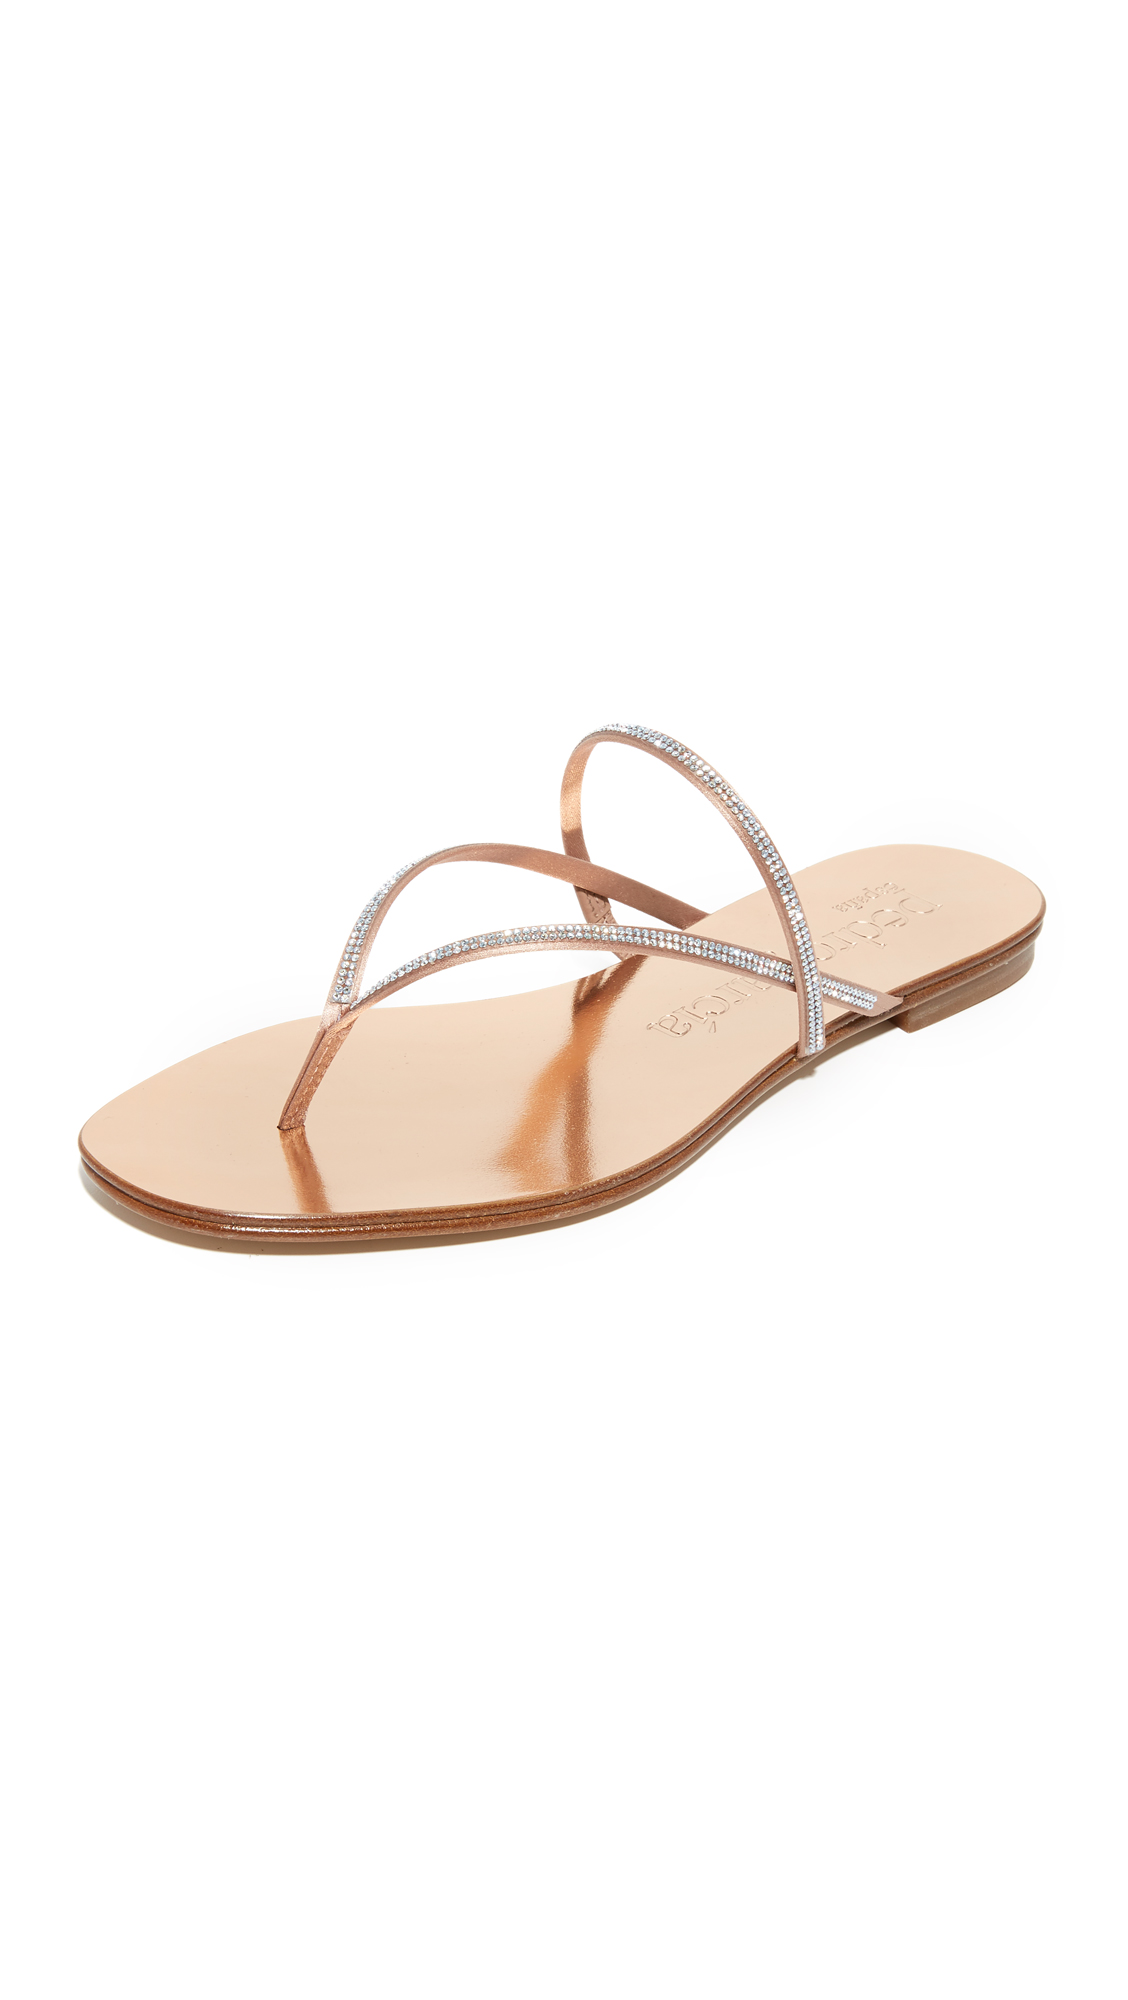 Pedro Garcia Enara Crystal Thong Sandals - Quartz